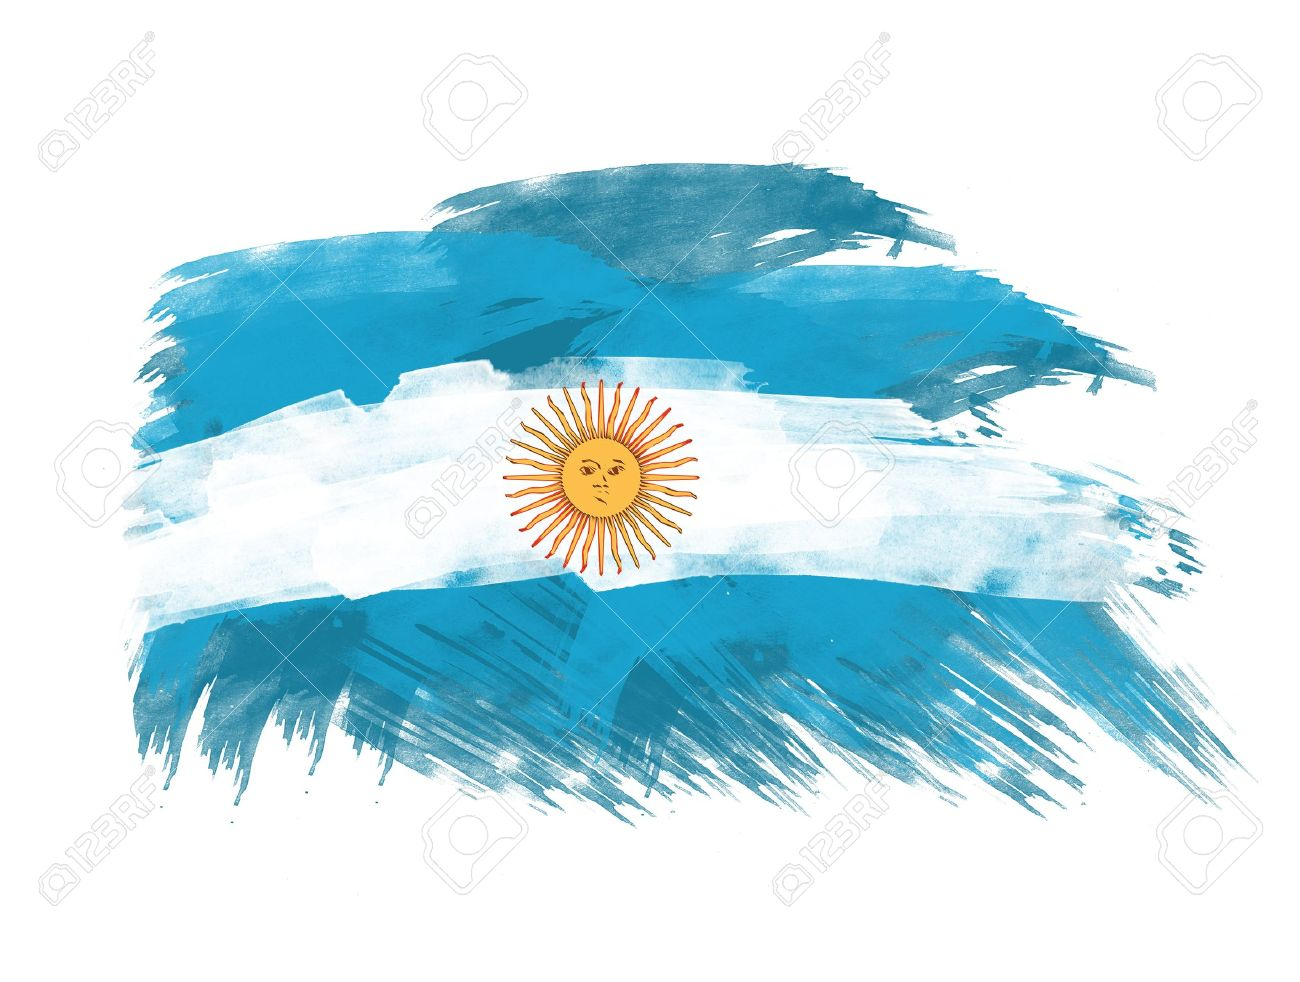 1300x982 Argentina Flag In Brush Strokes In White Background Stock Photo